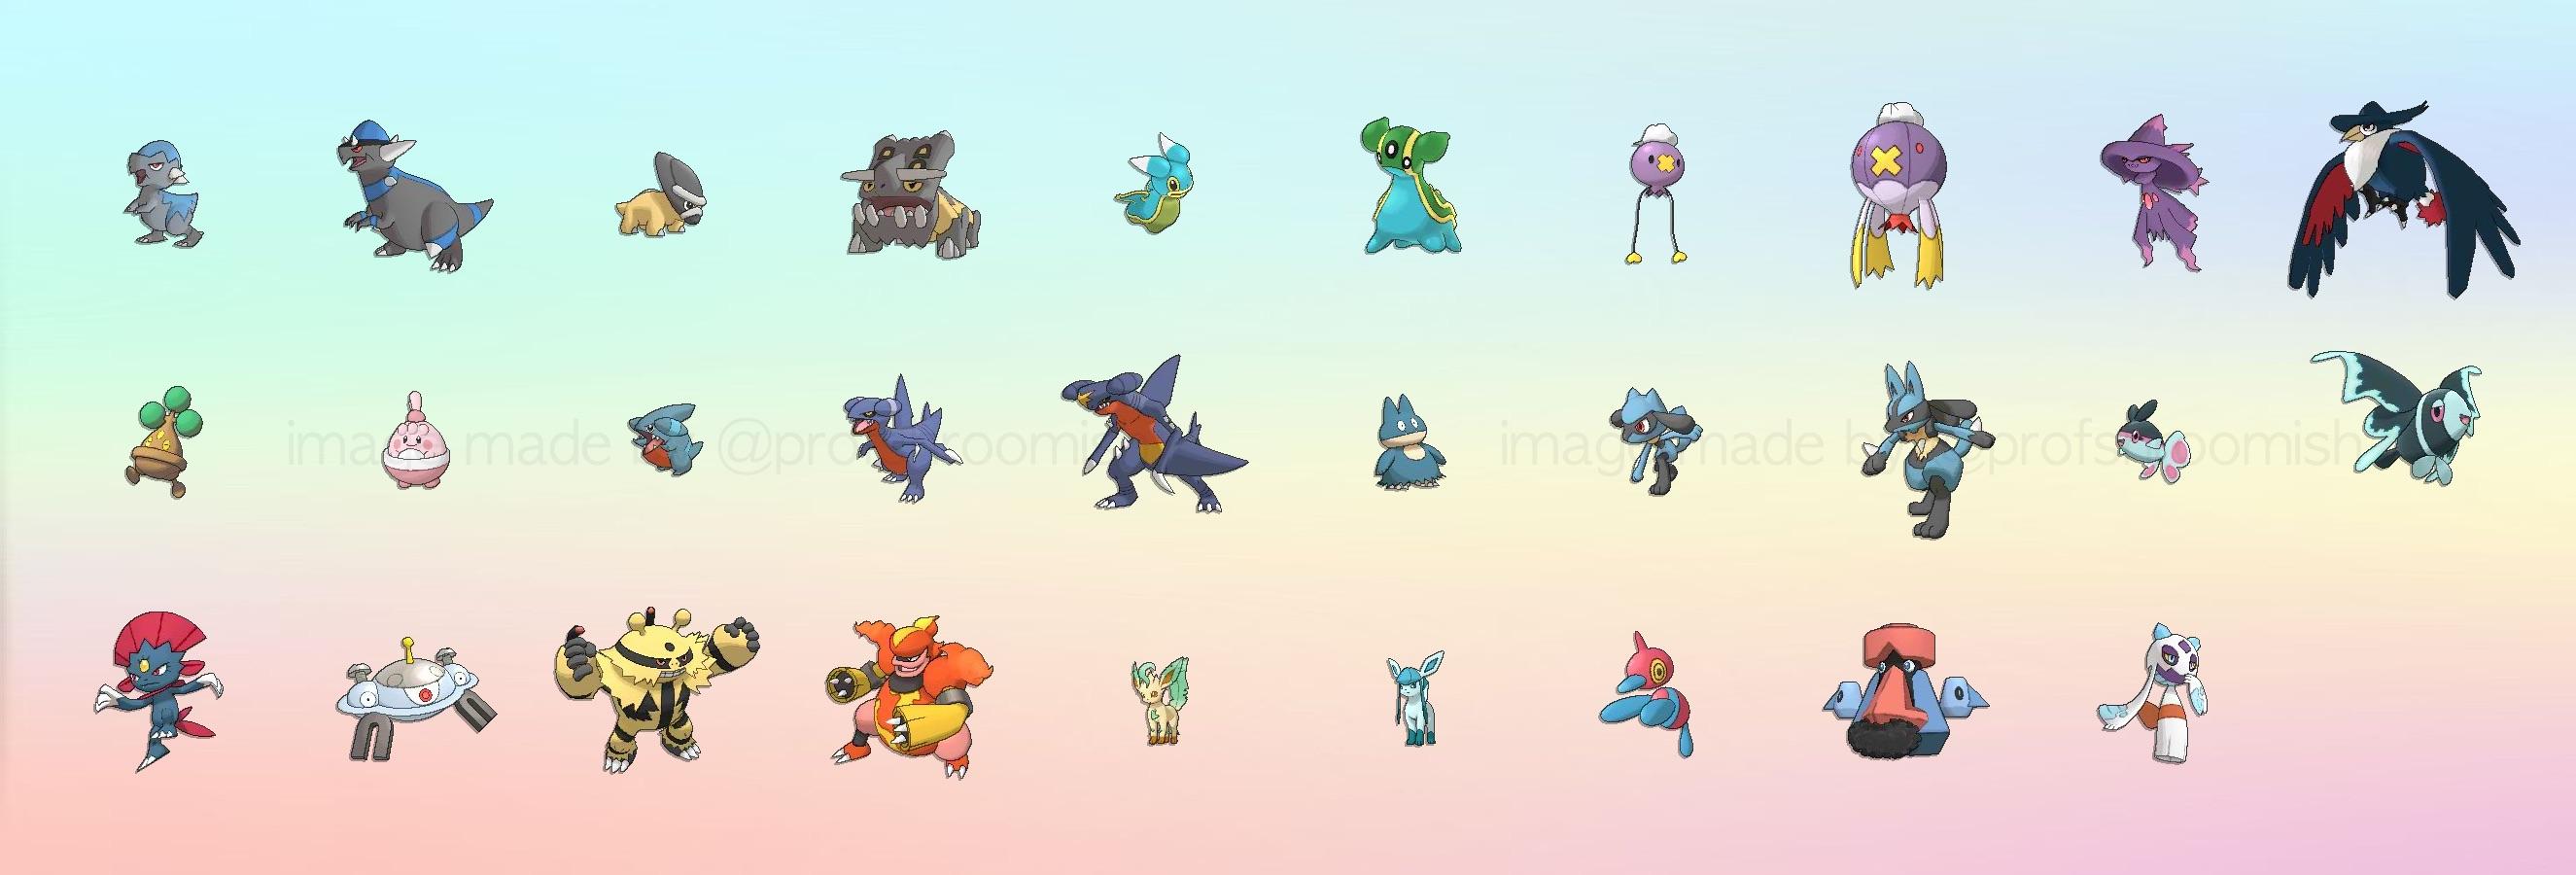 PokemonSoleil 3DS Div 021